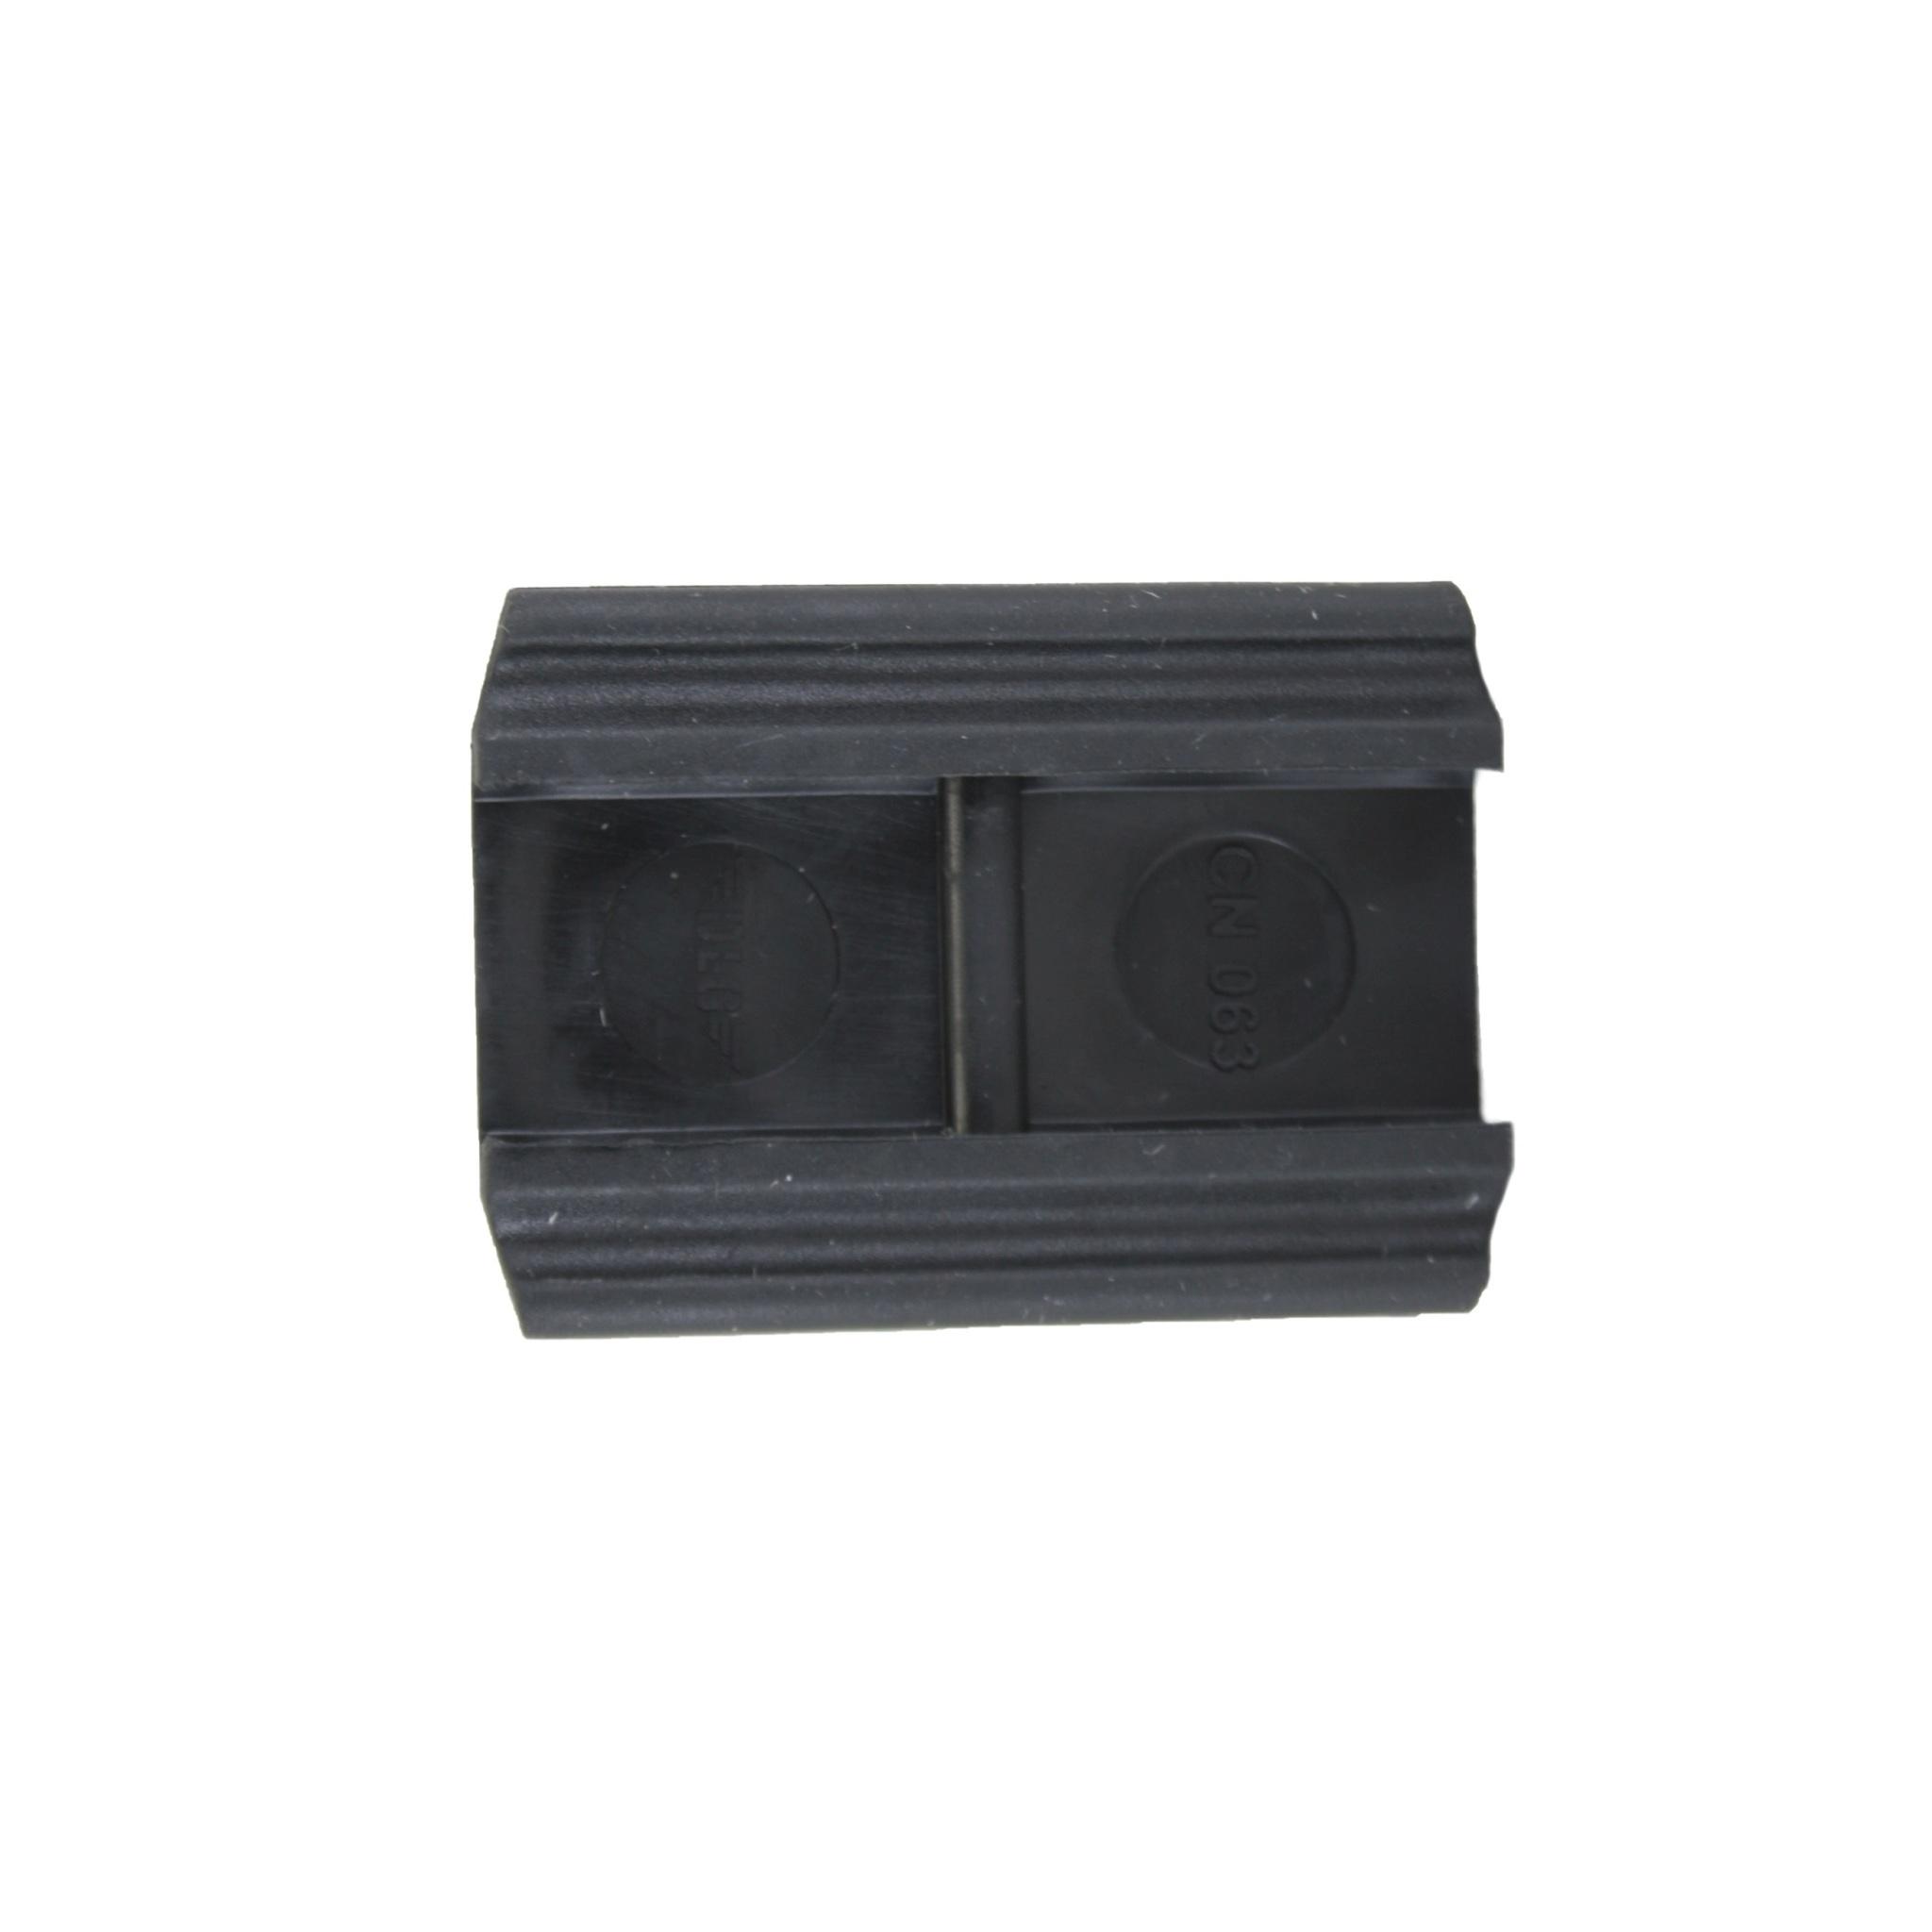 Накладка на планку Пикатинни 5 см, DLG Tactical - вид изнутри